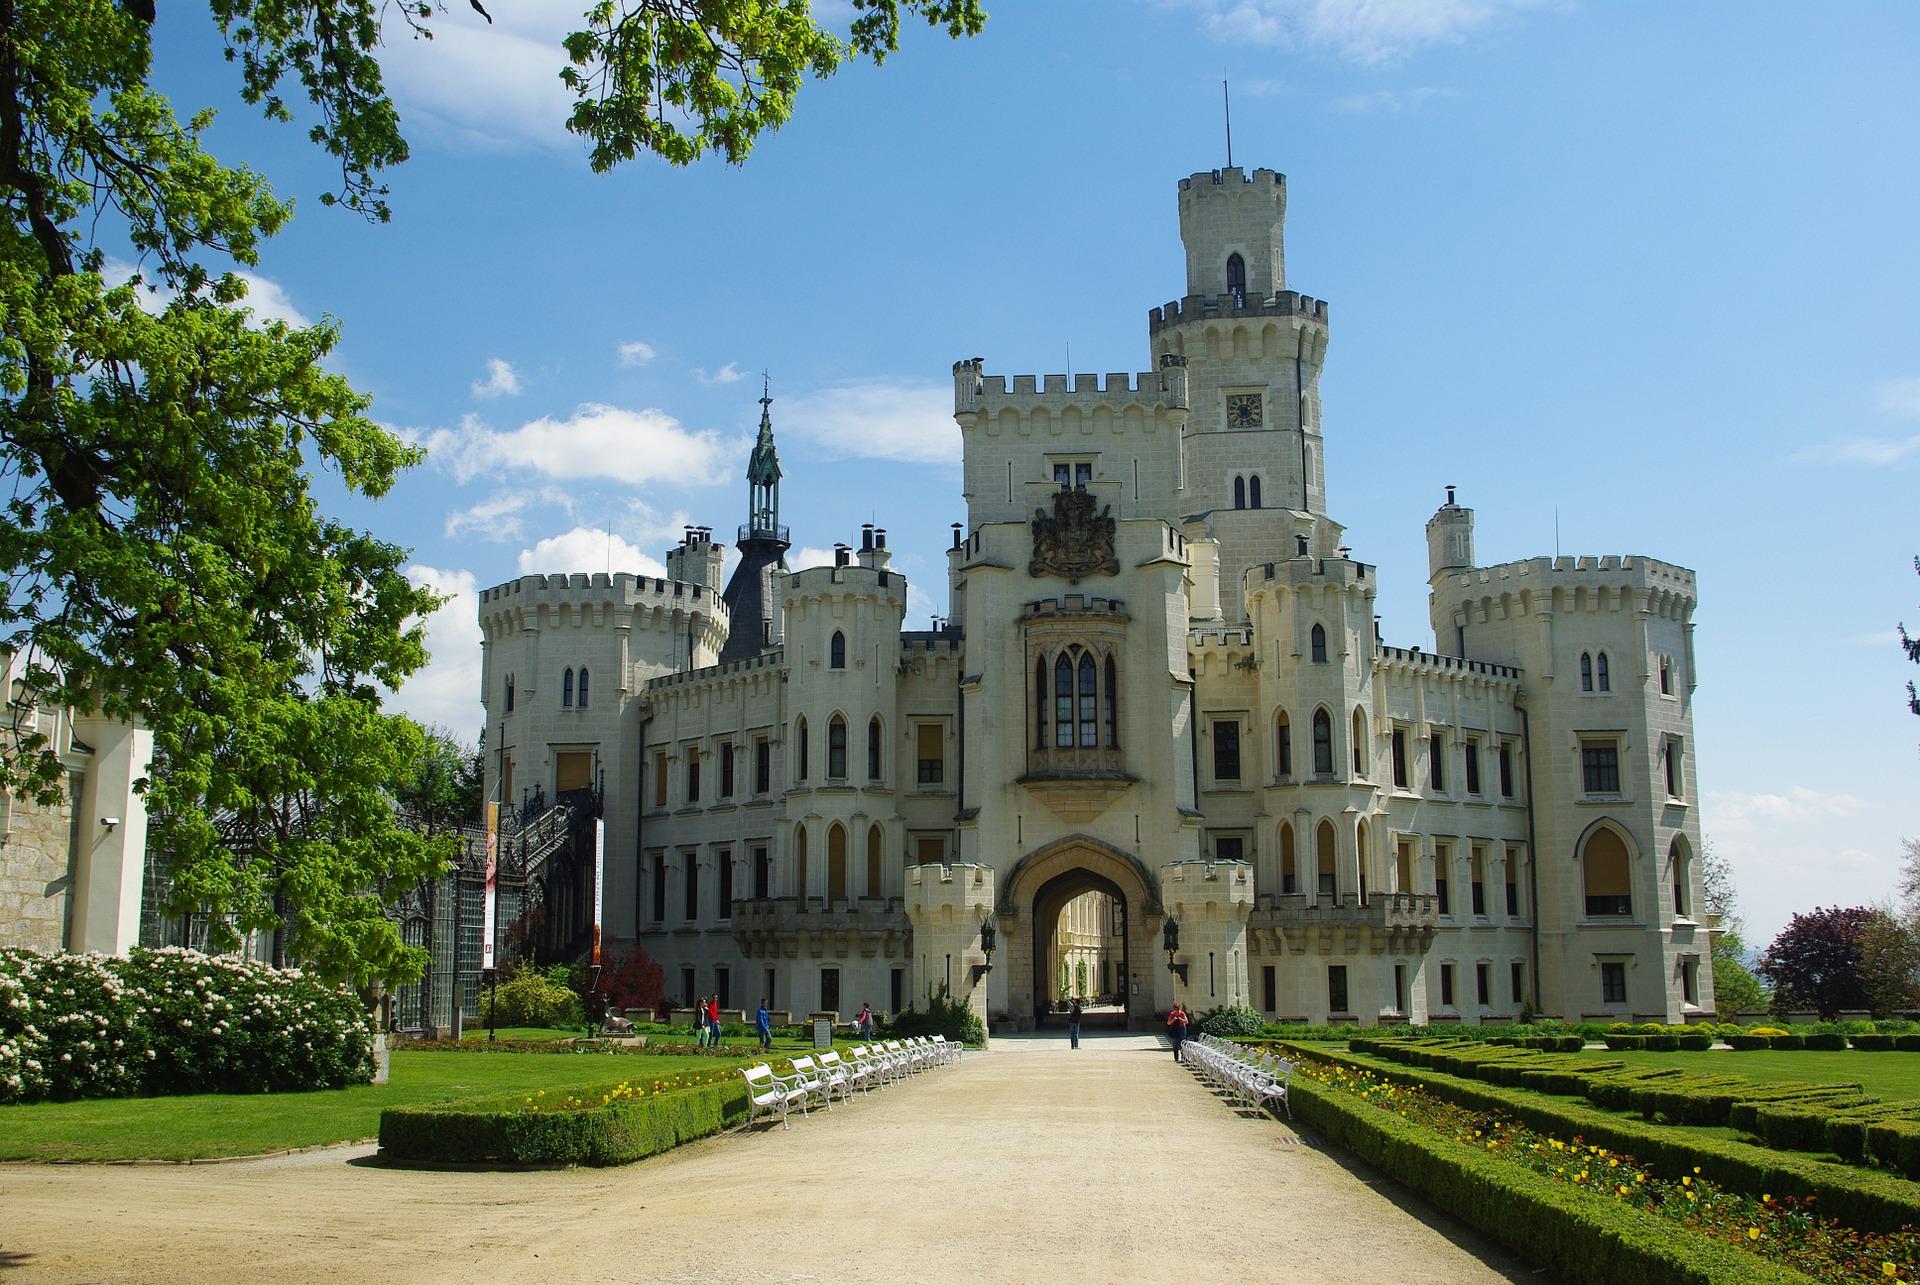 Hluboka nad Vltavou Castle near Cesky Krumlov